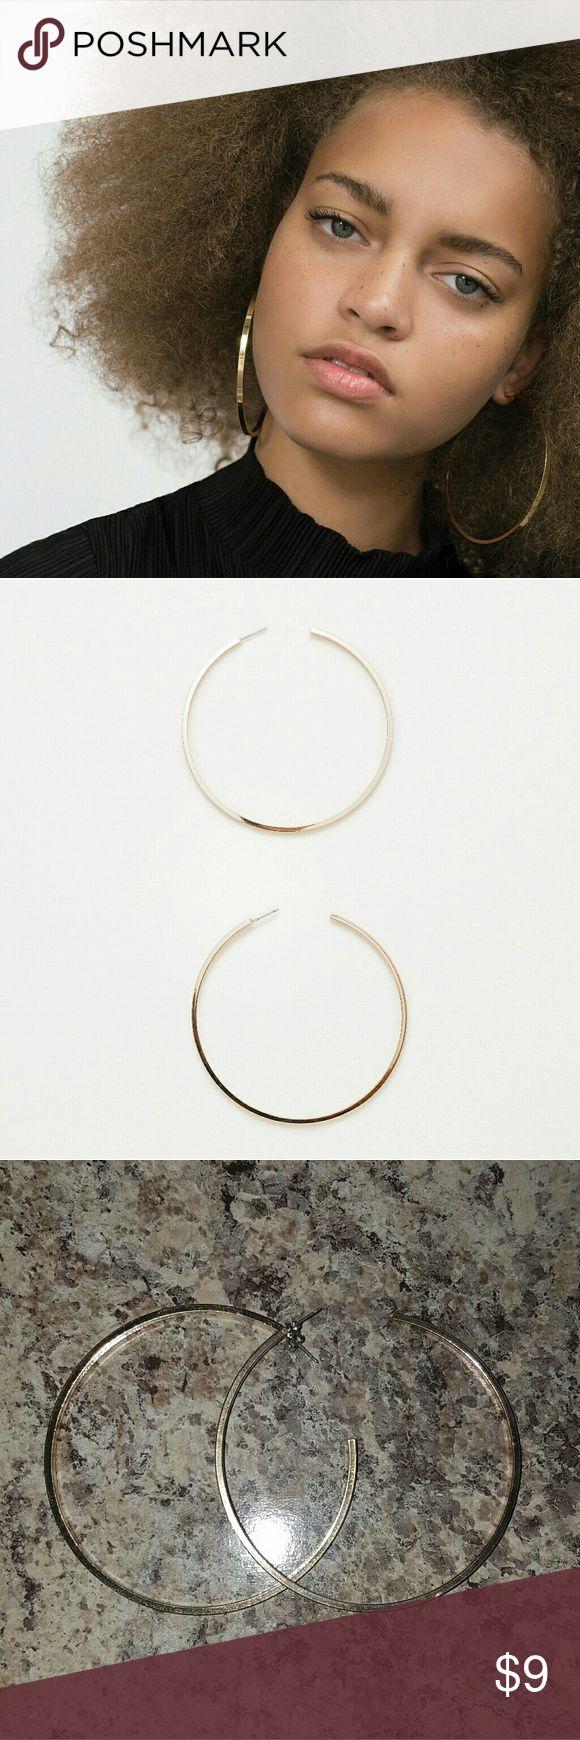 "Zara Large Hoop Earrings Zara Golden Large Hoop Earrings.  3"" diameter ZARA  Jewelry Earrings"